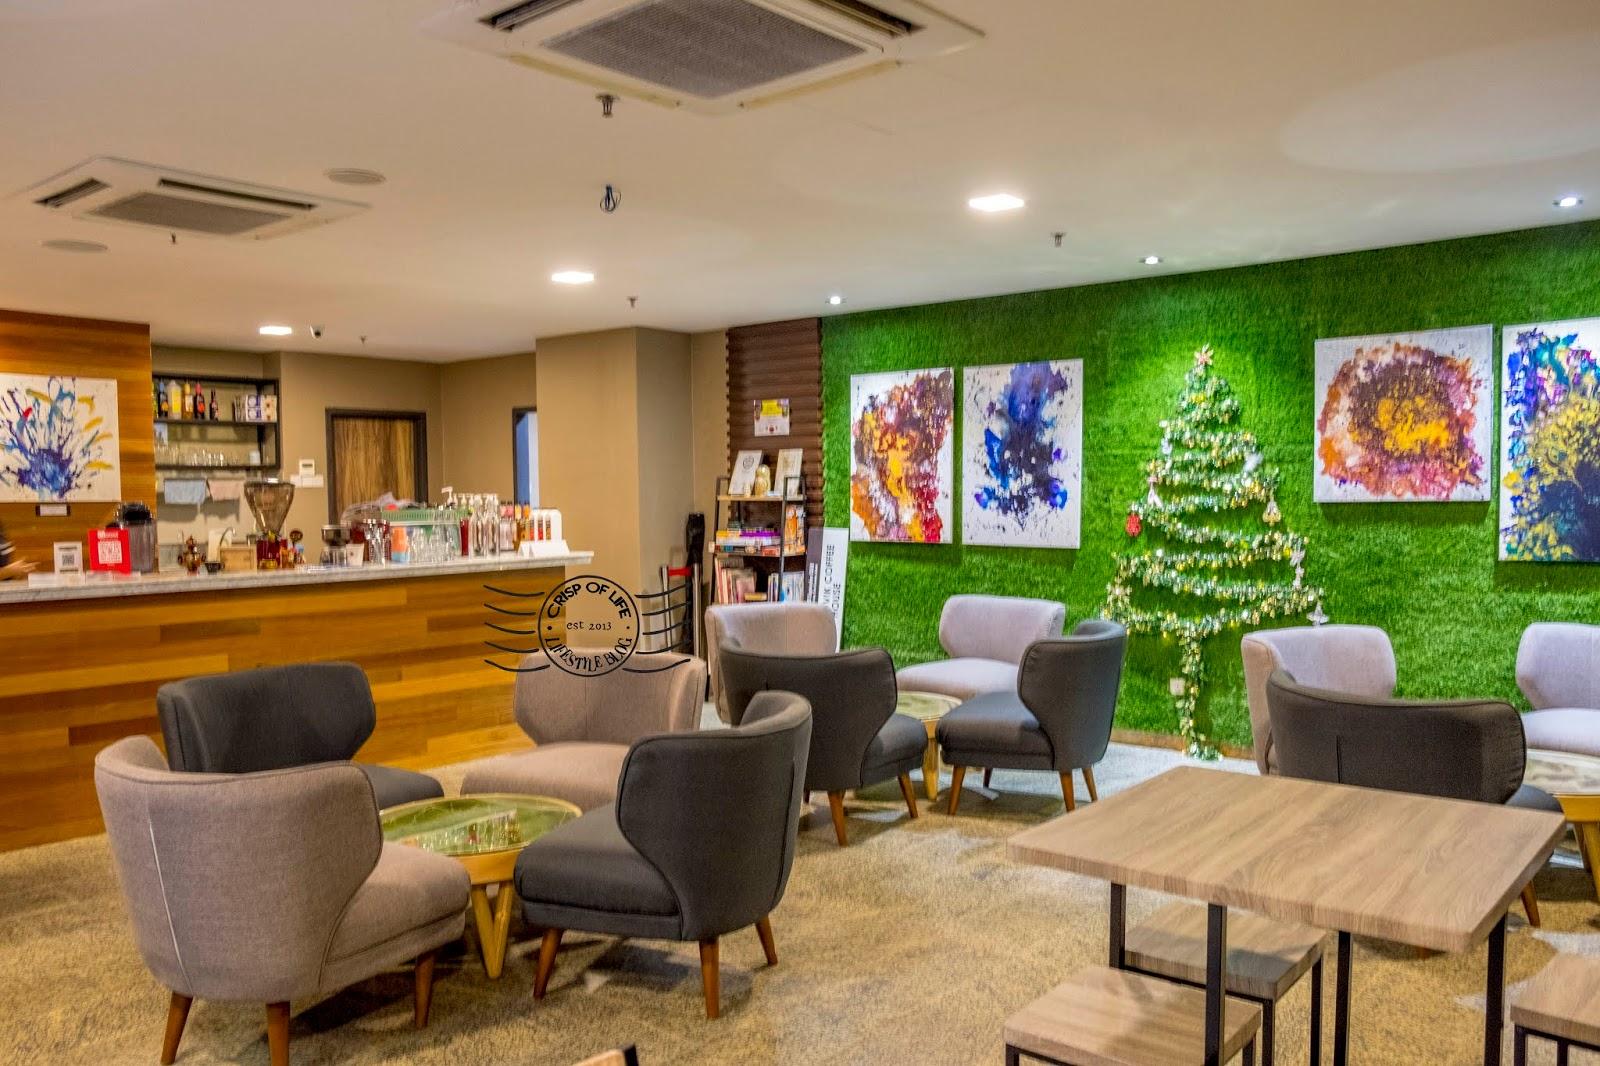 Medovik Coffee House @ Level 8, Bay 21 Likas, Kota Kinabalu, Sabah